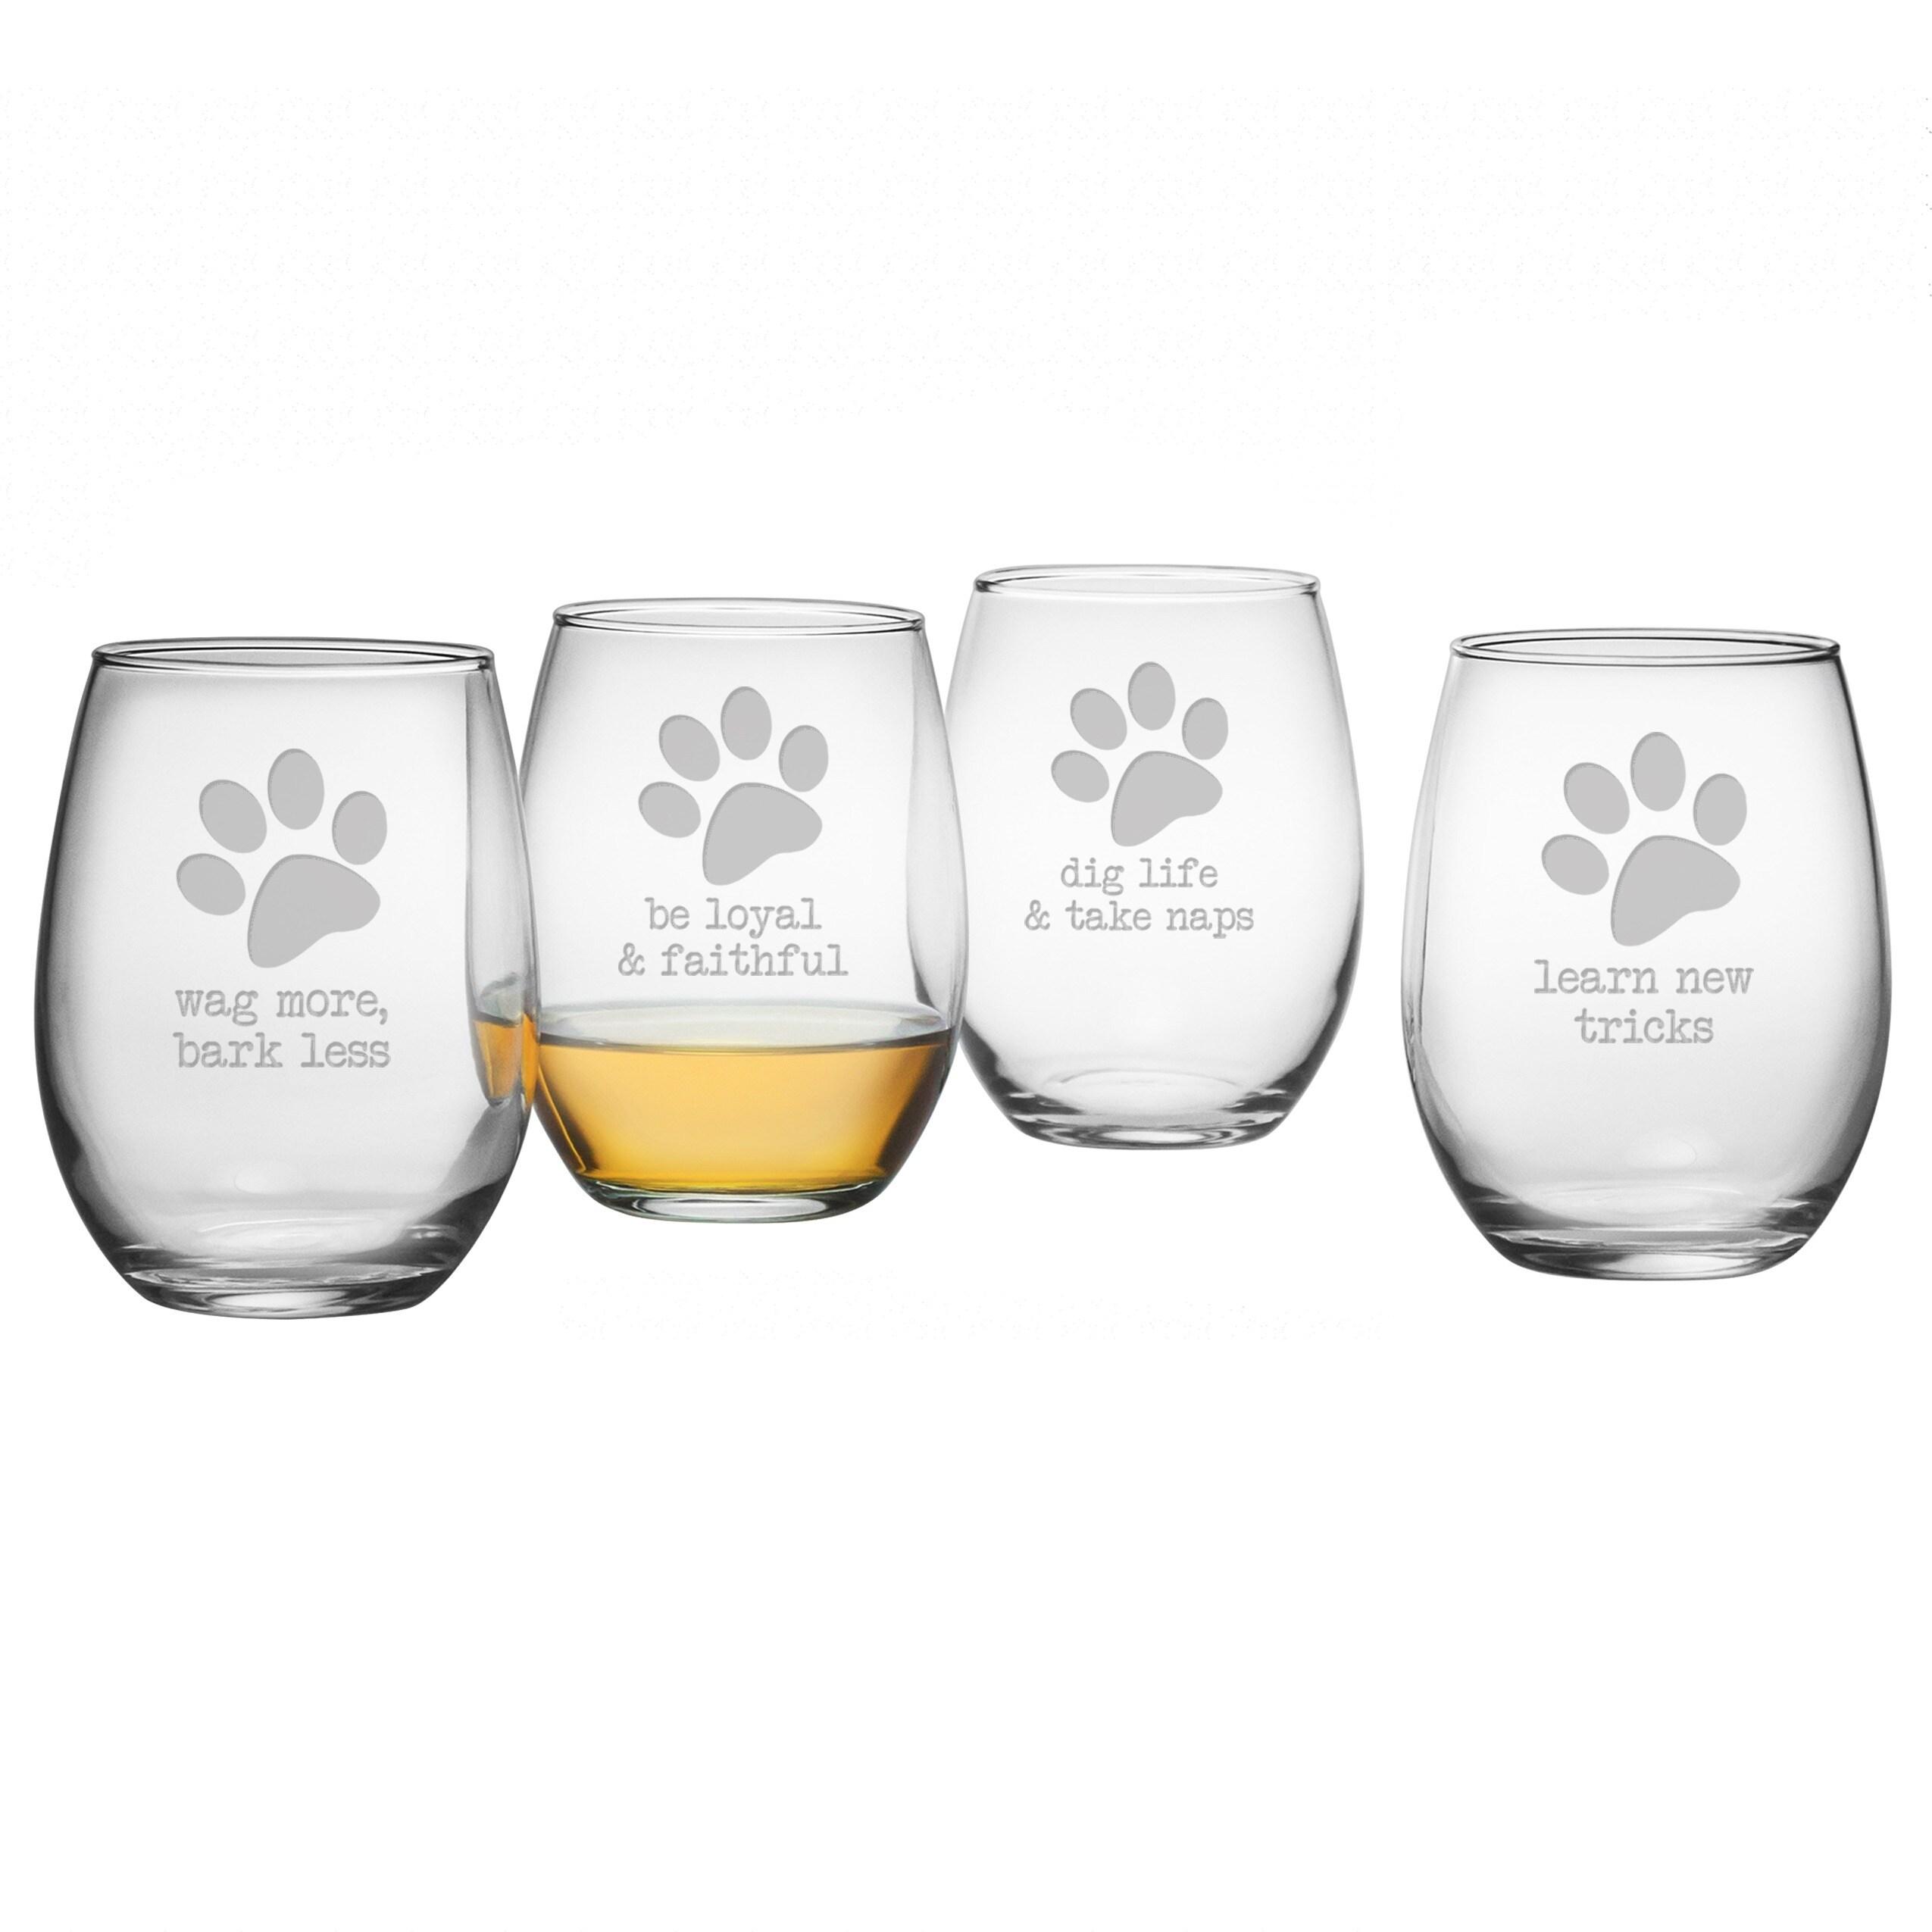 Popular Dog Wisdom Stemless Wine Glasses (Set of 4) - Free Shipping On  ZE62